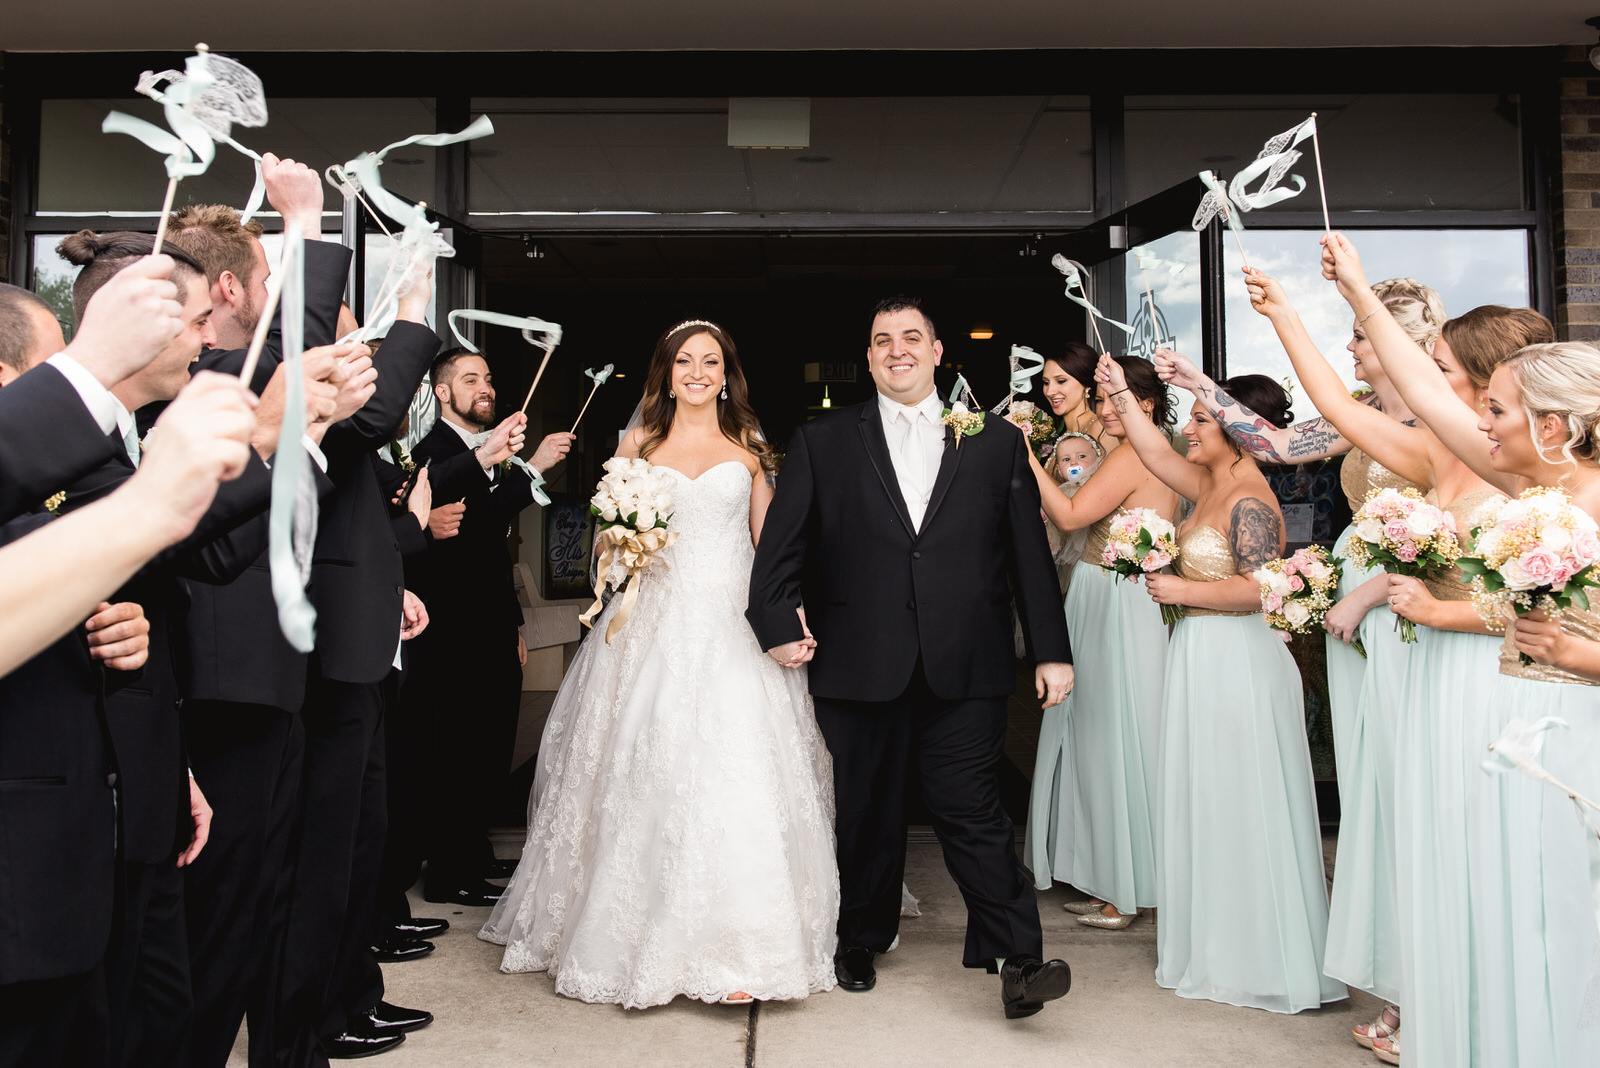 Laube_Banquet_Hall__Wedding_Photos_050.jpg